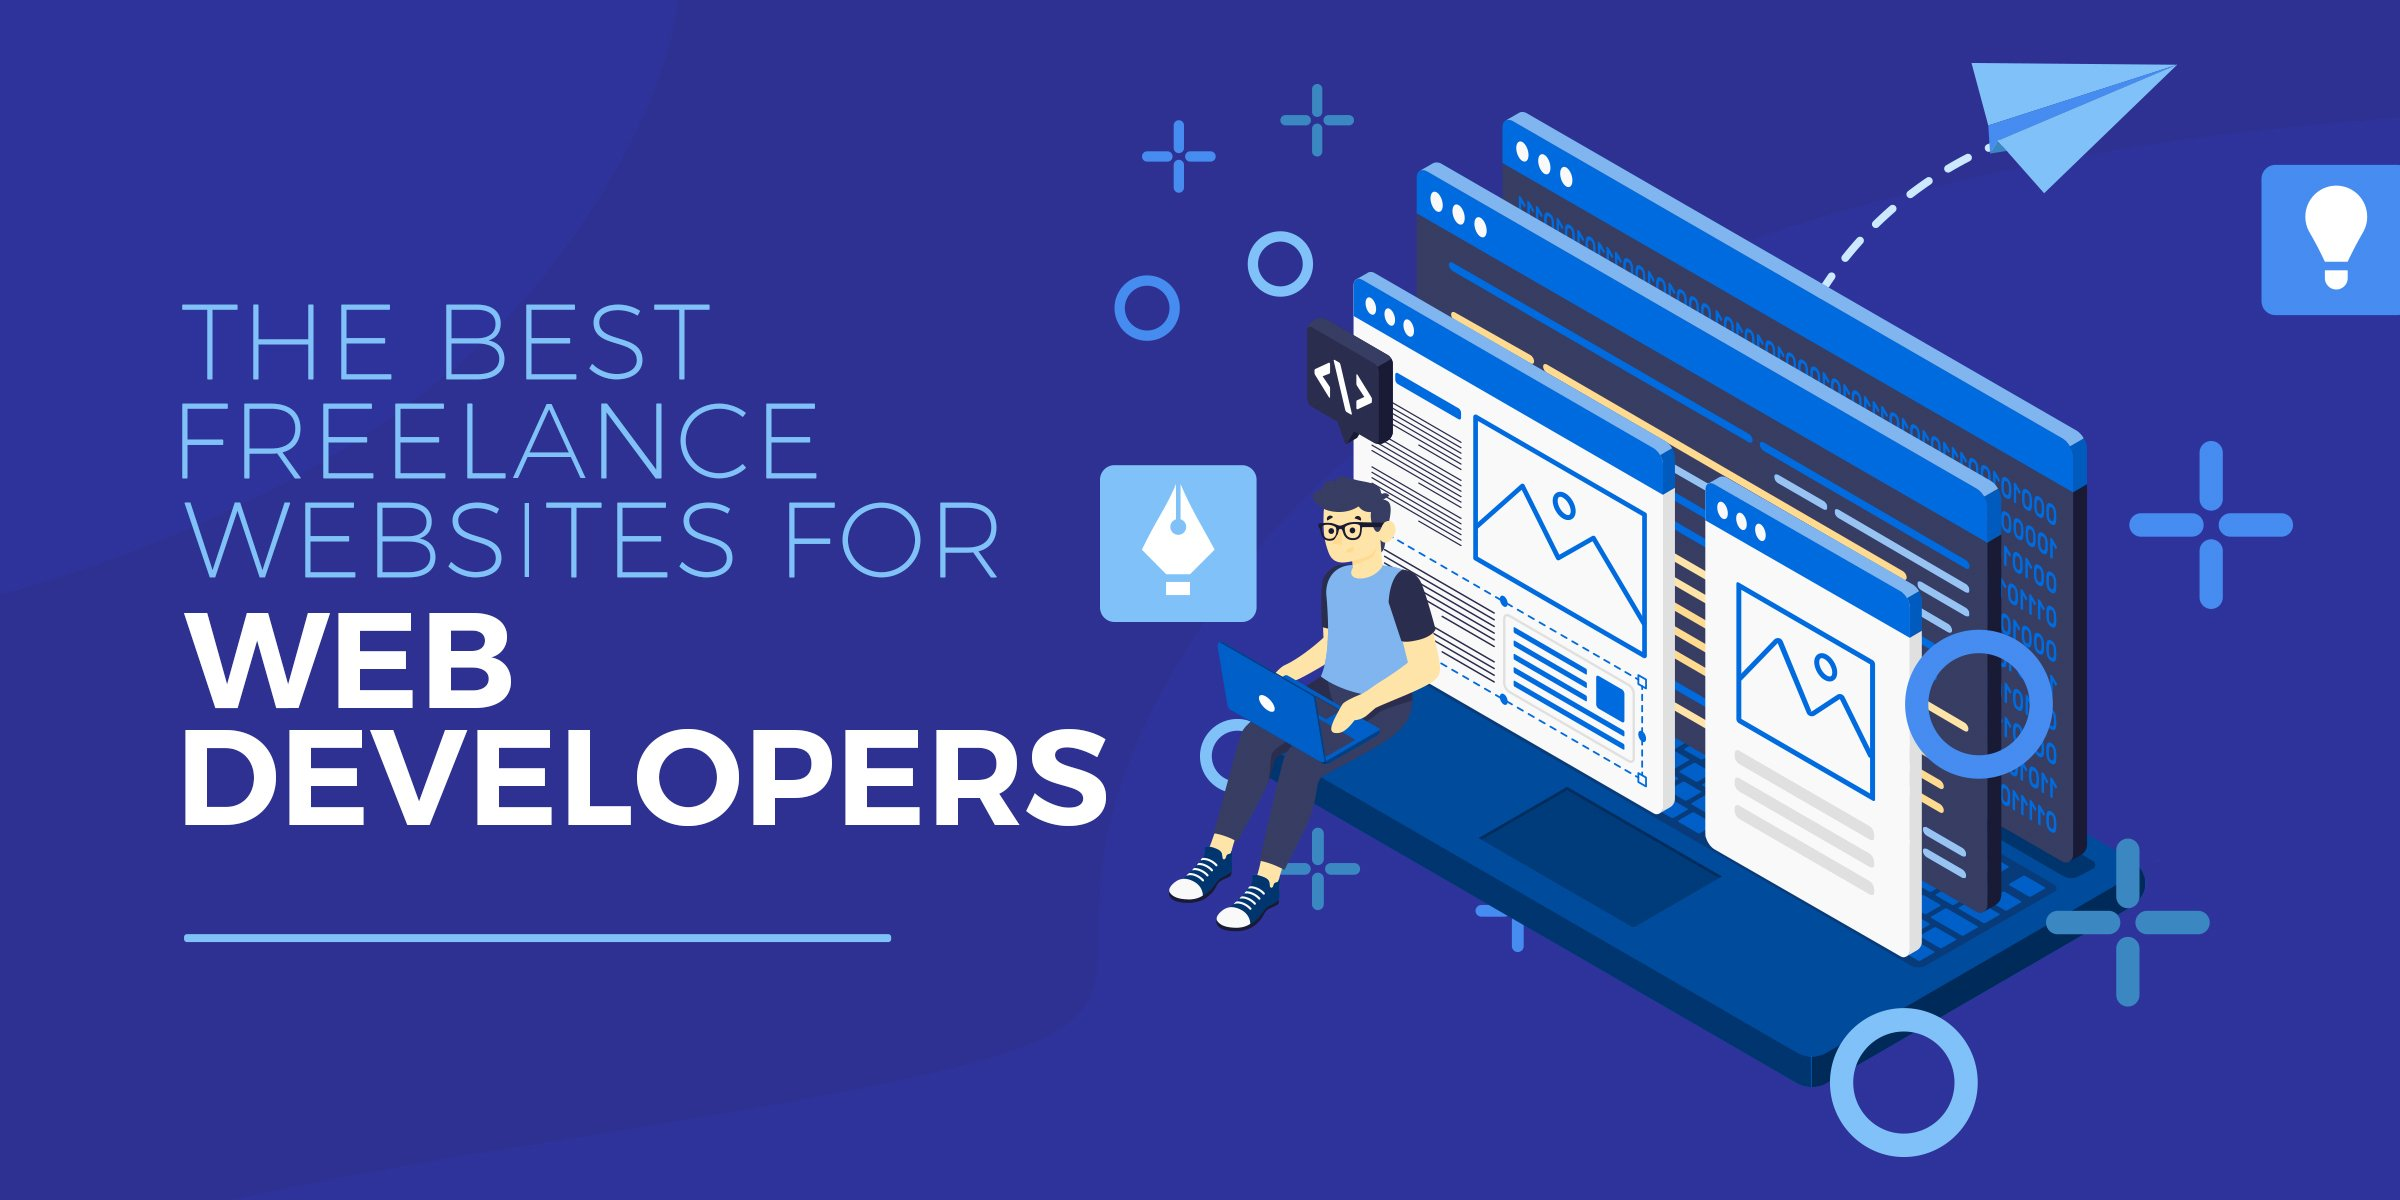 Best Freelance Websites for Developers